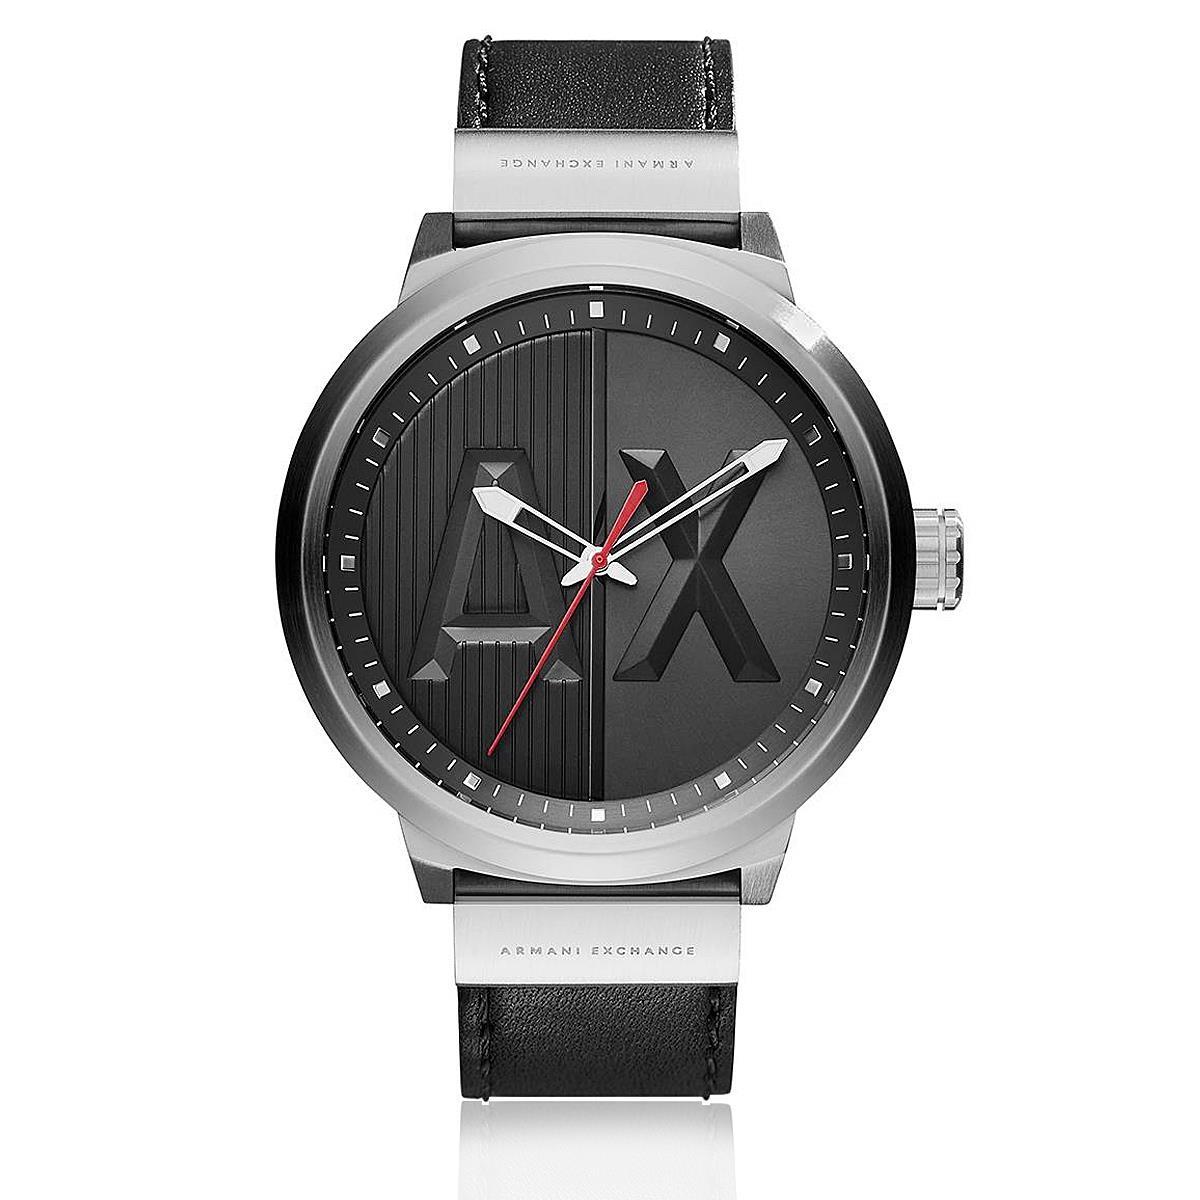 83a9ef9957ab7 Relógio Masculino Armani Exchange Analógico AX1361 0PN Couro Preto